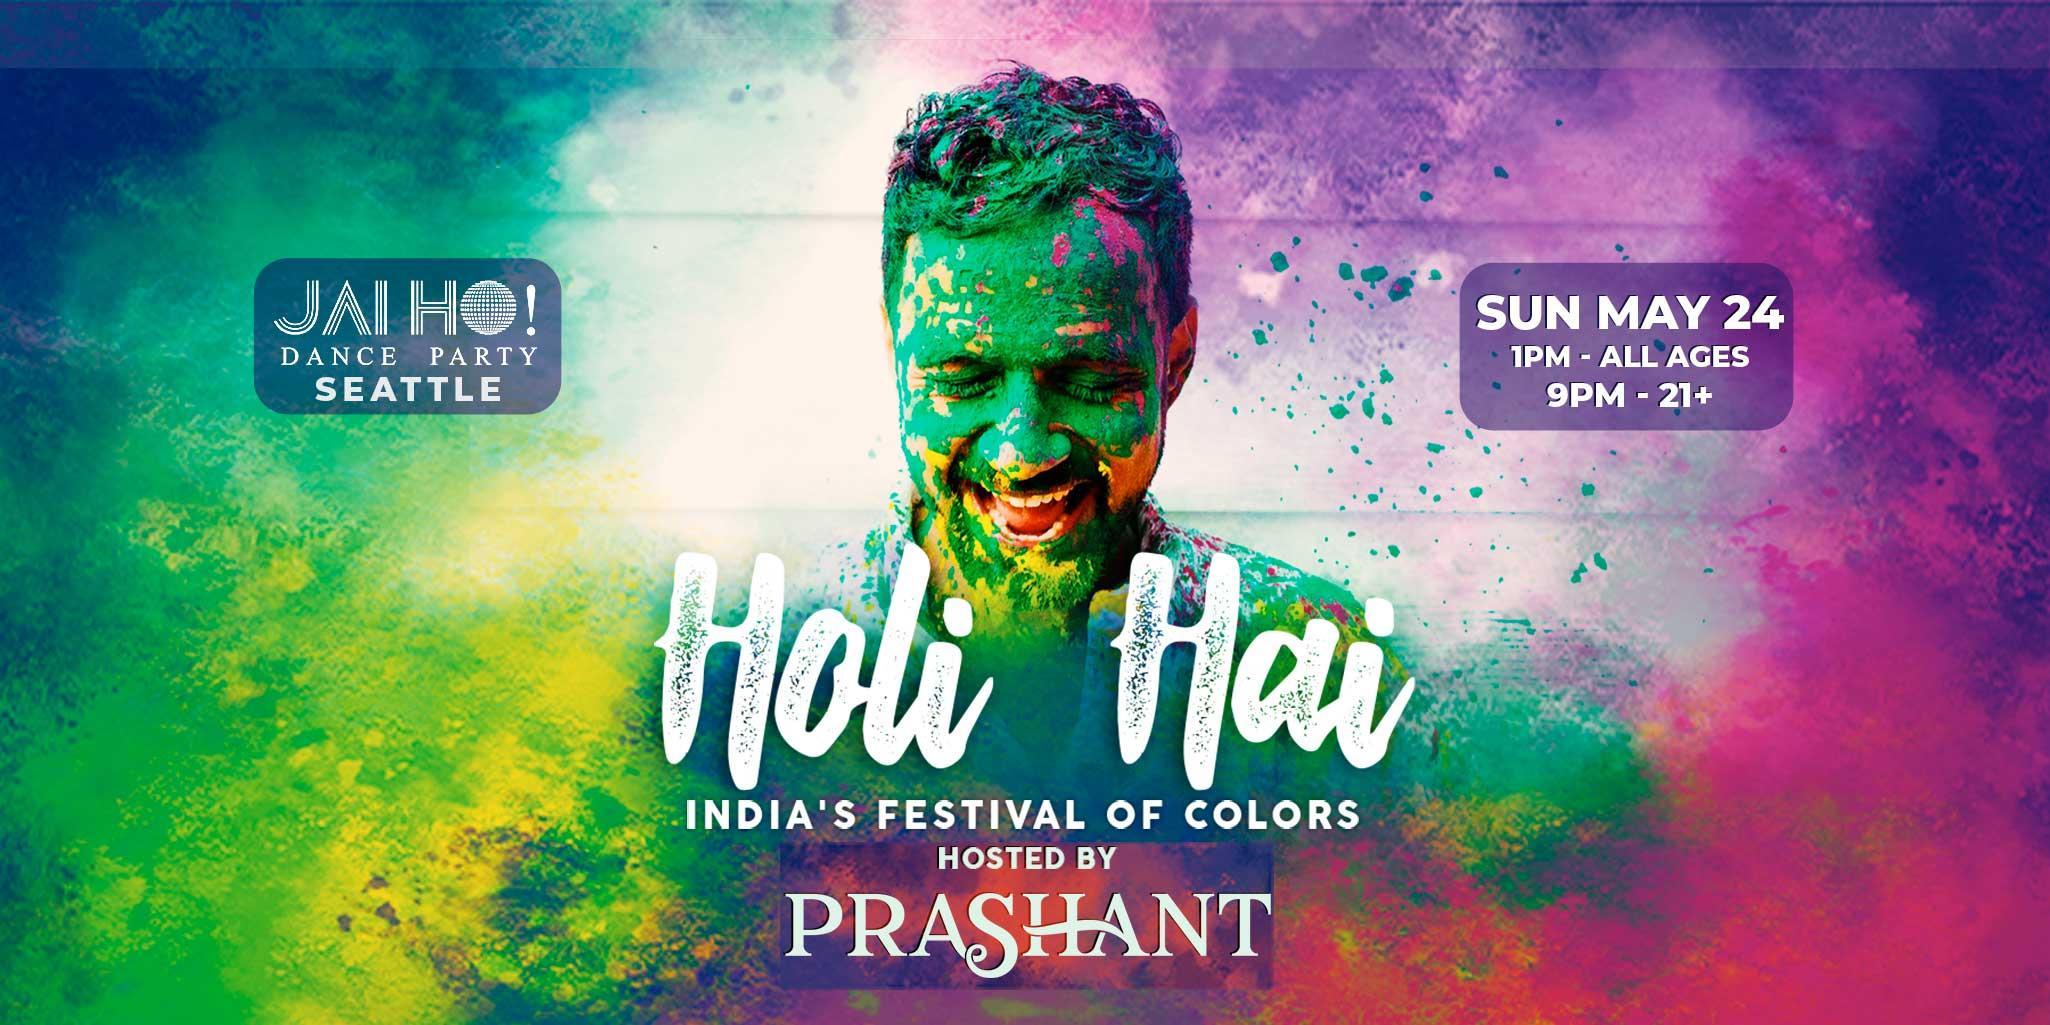 Holi Hai! All Ages Color Festival in Seattle w/ DJ Prashant